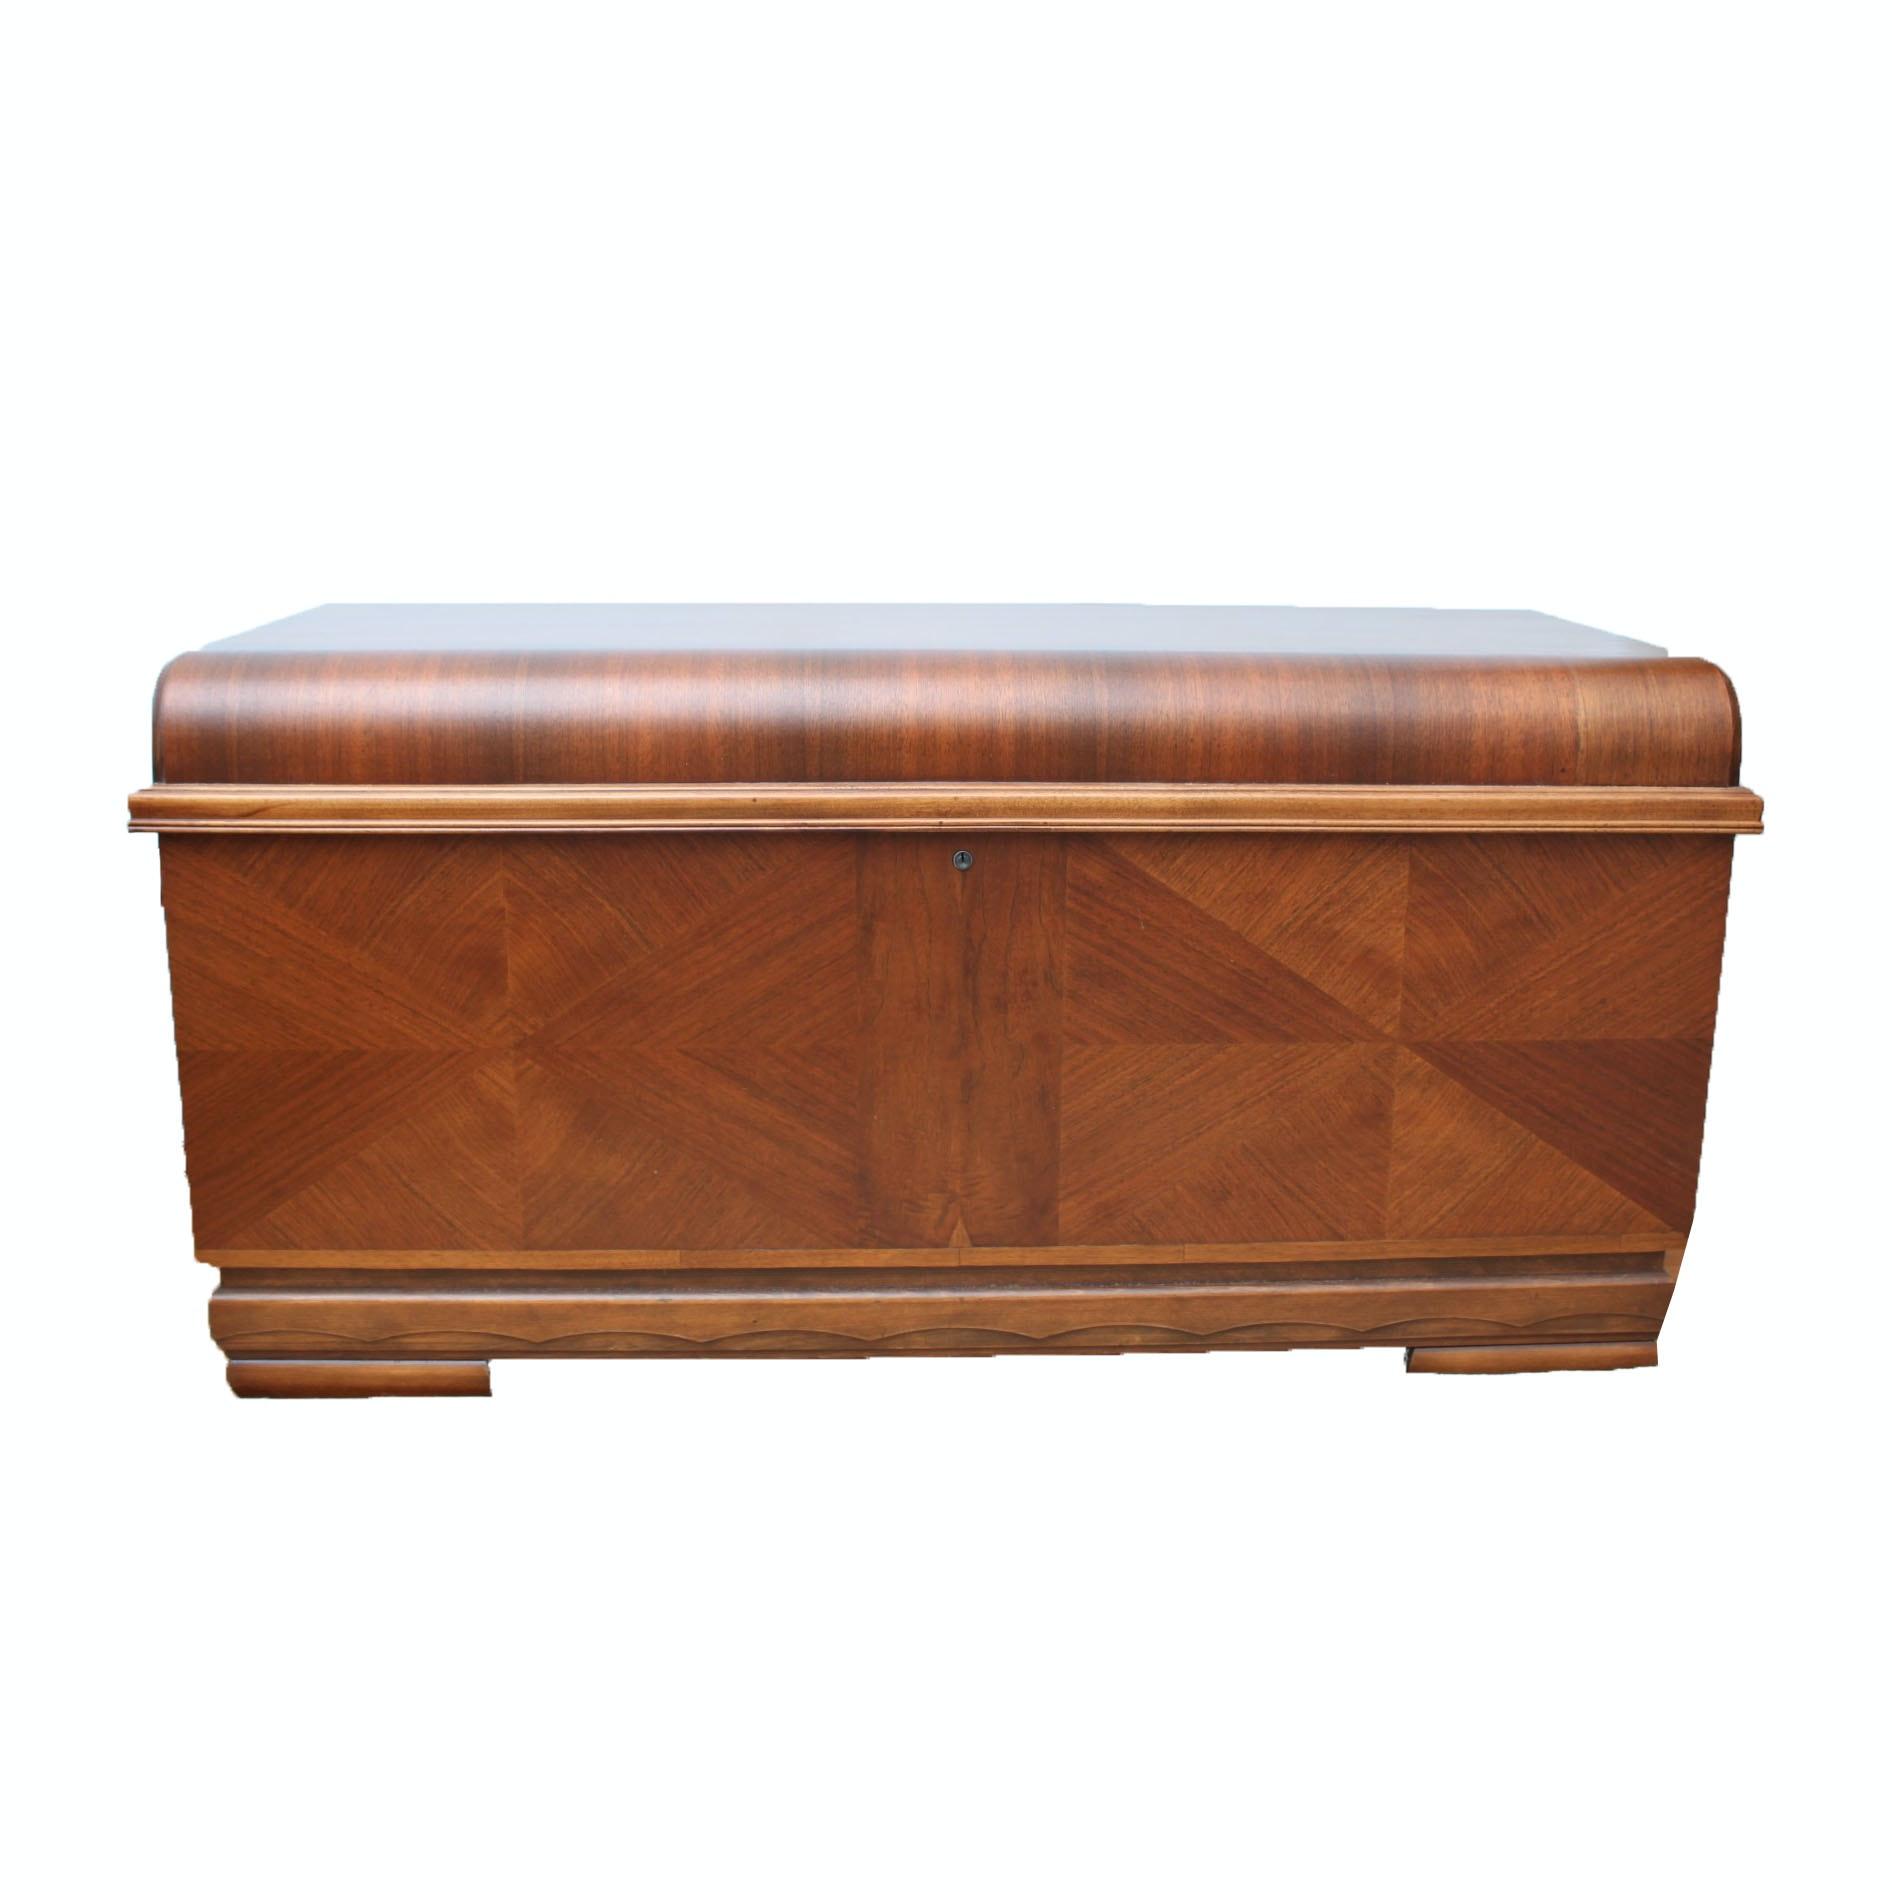 Vintage Mahogany Veneered and Cedar Lined Chest